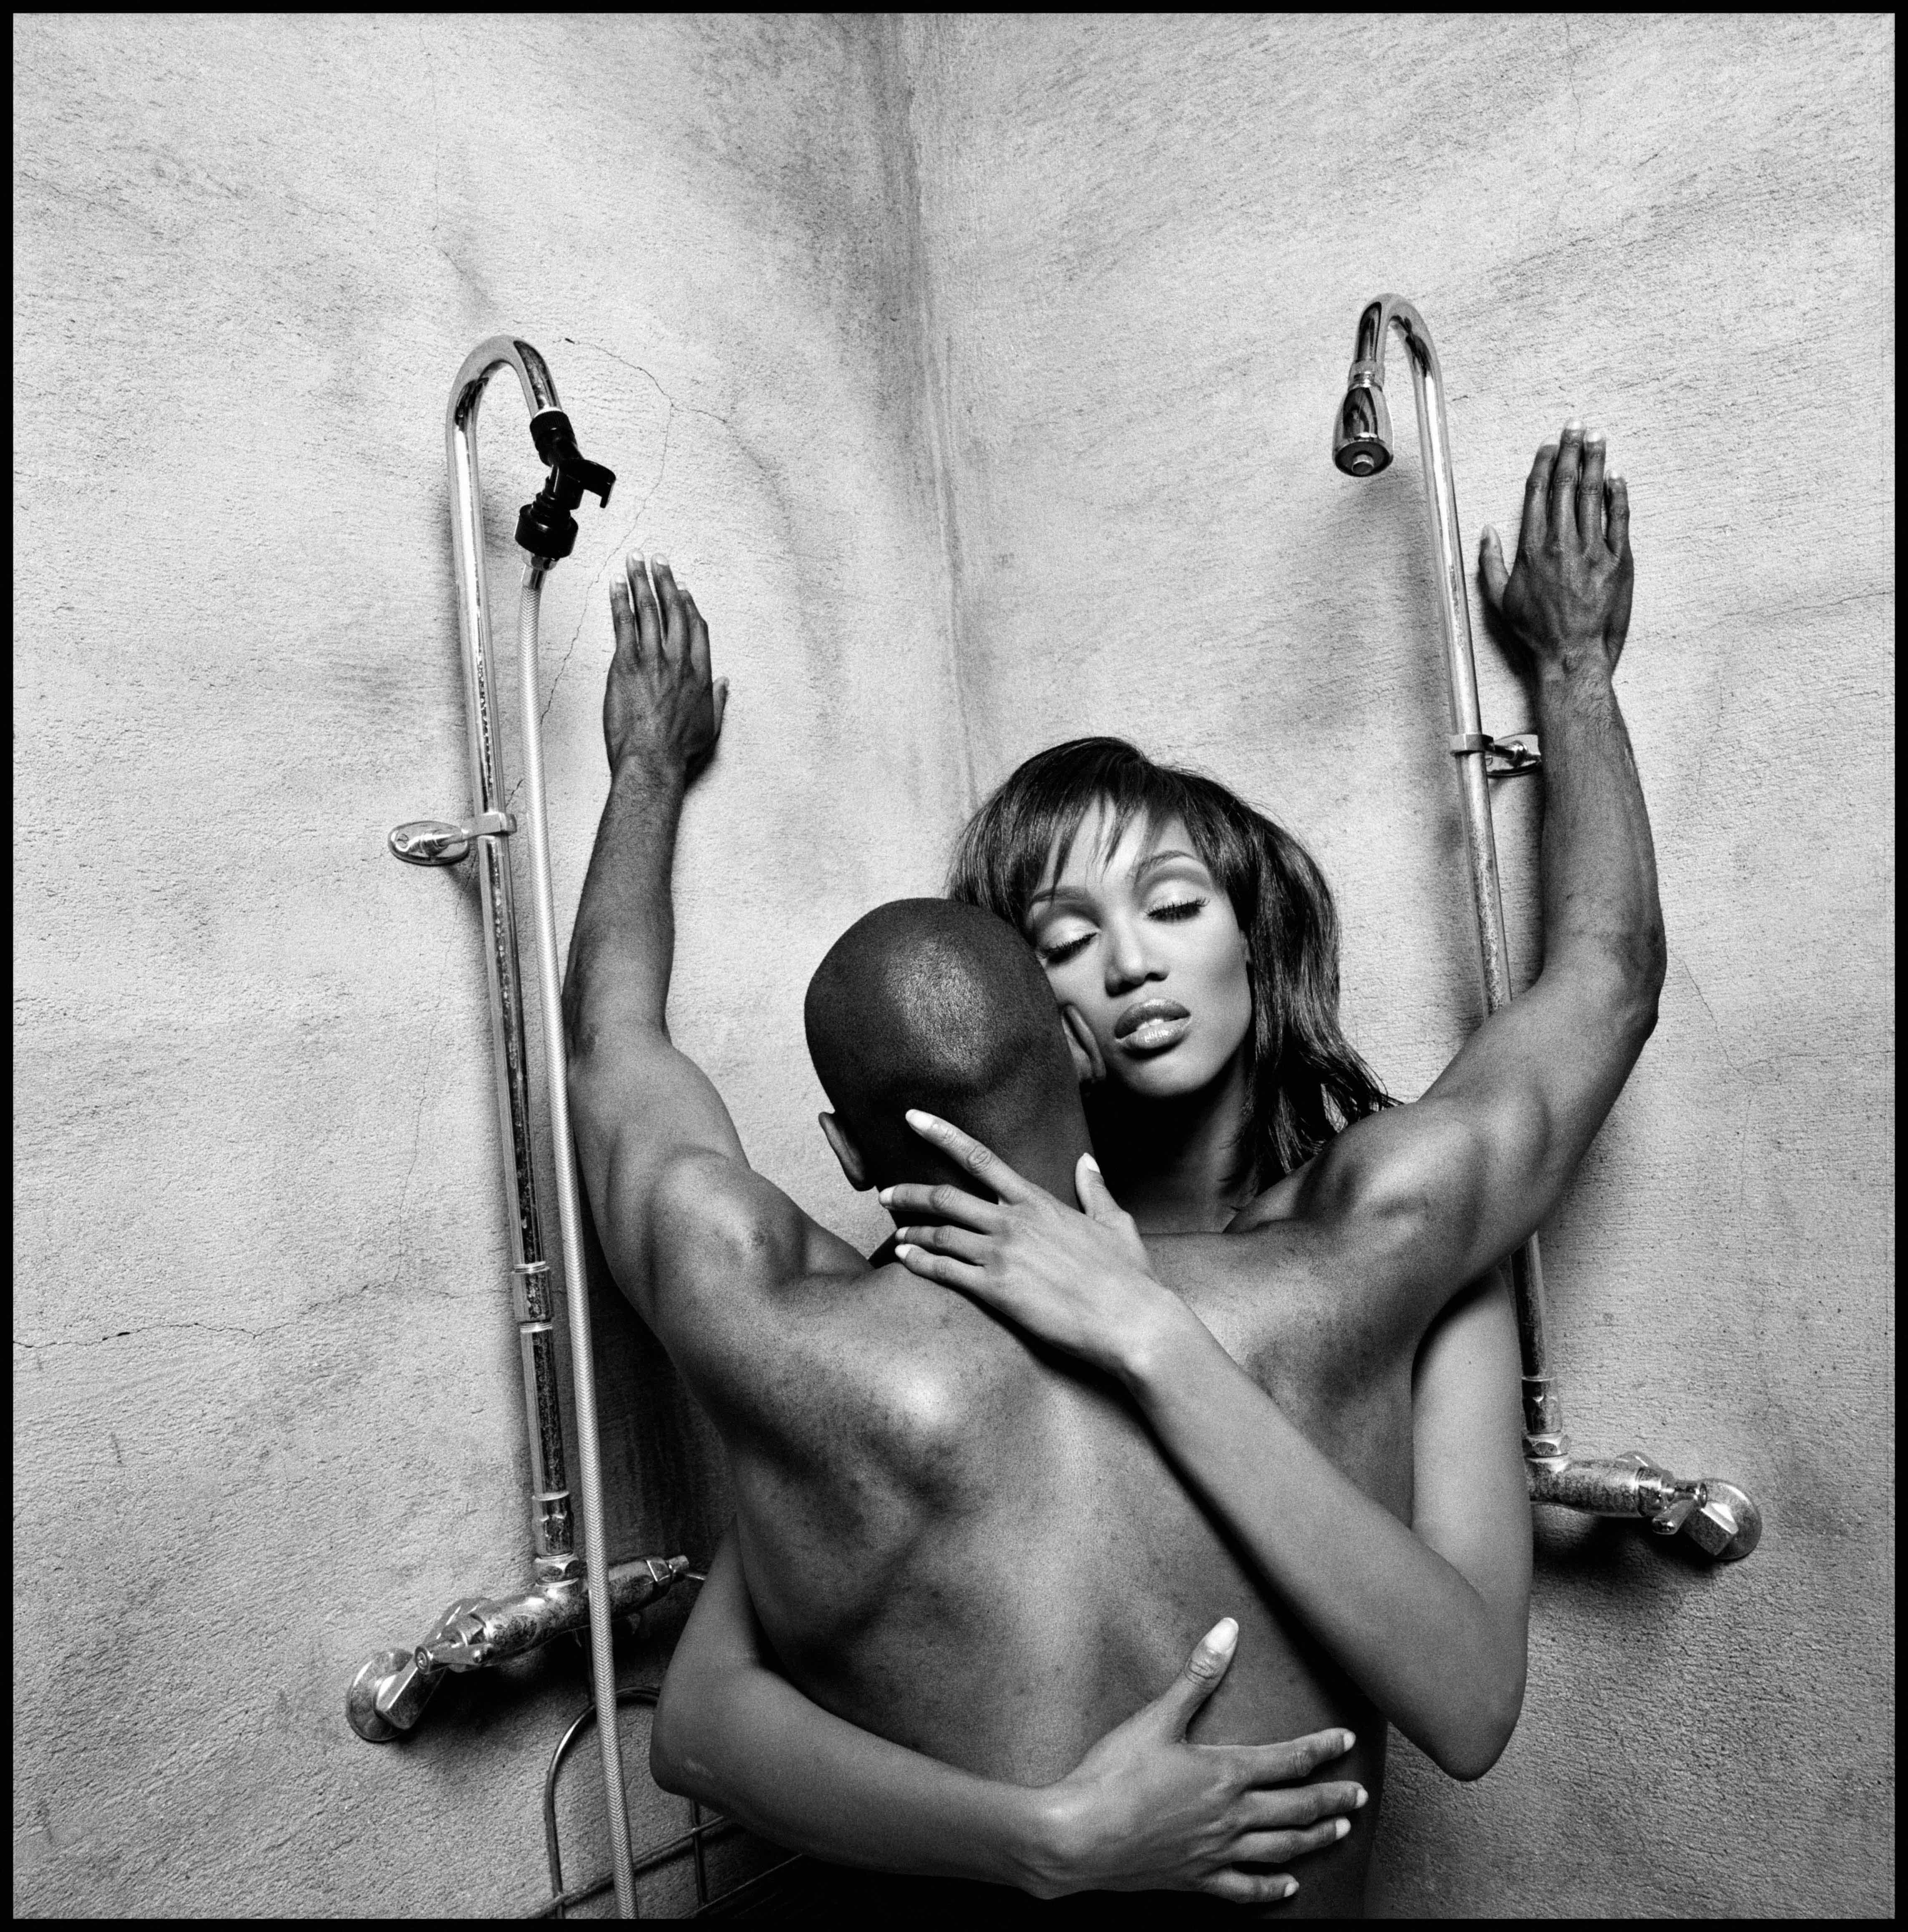 Model and actress Tyra Banks embraces film director John Singleton, 1994 © Eli Reed / Magnum Photos